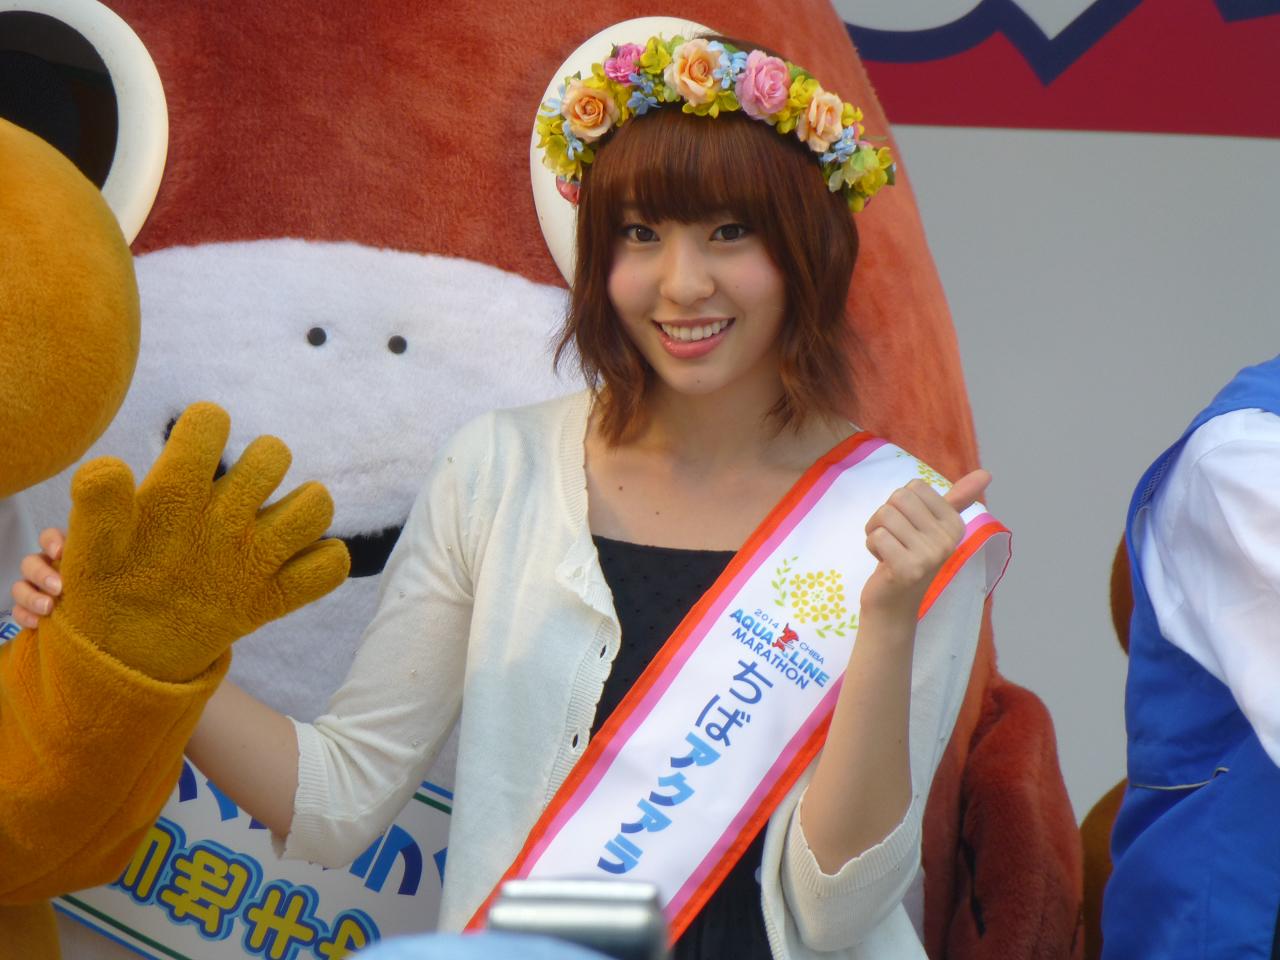 'Fujie Reina' NMB48 Menjadi Brand Ambasador Chiba Aqualine Marathon 2014